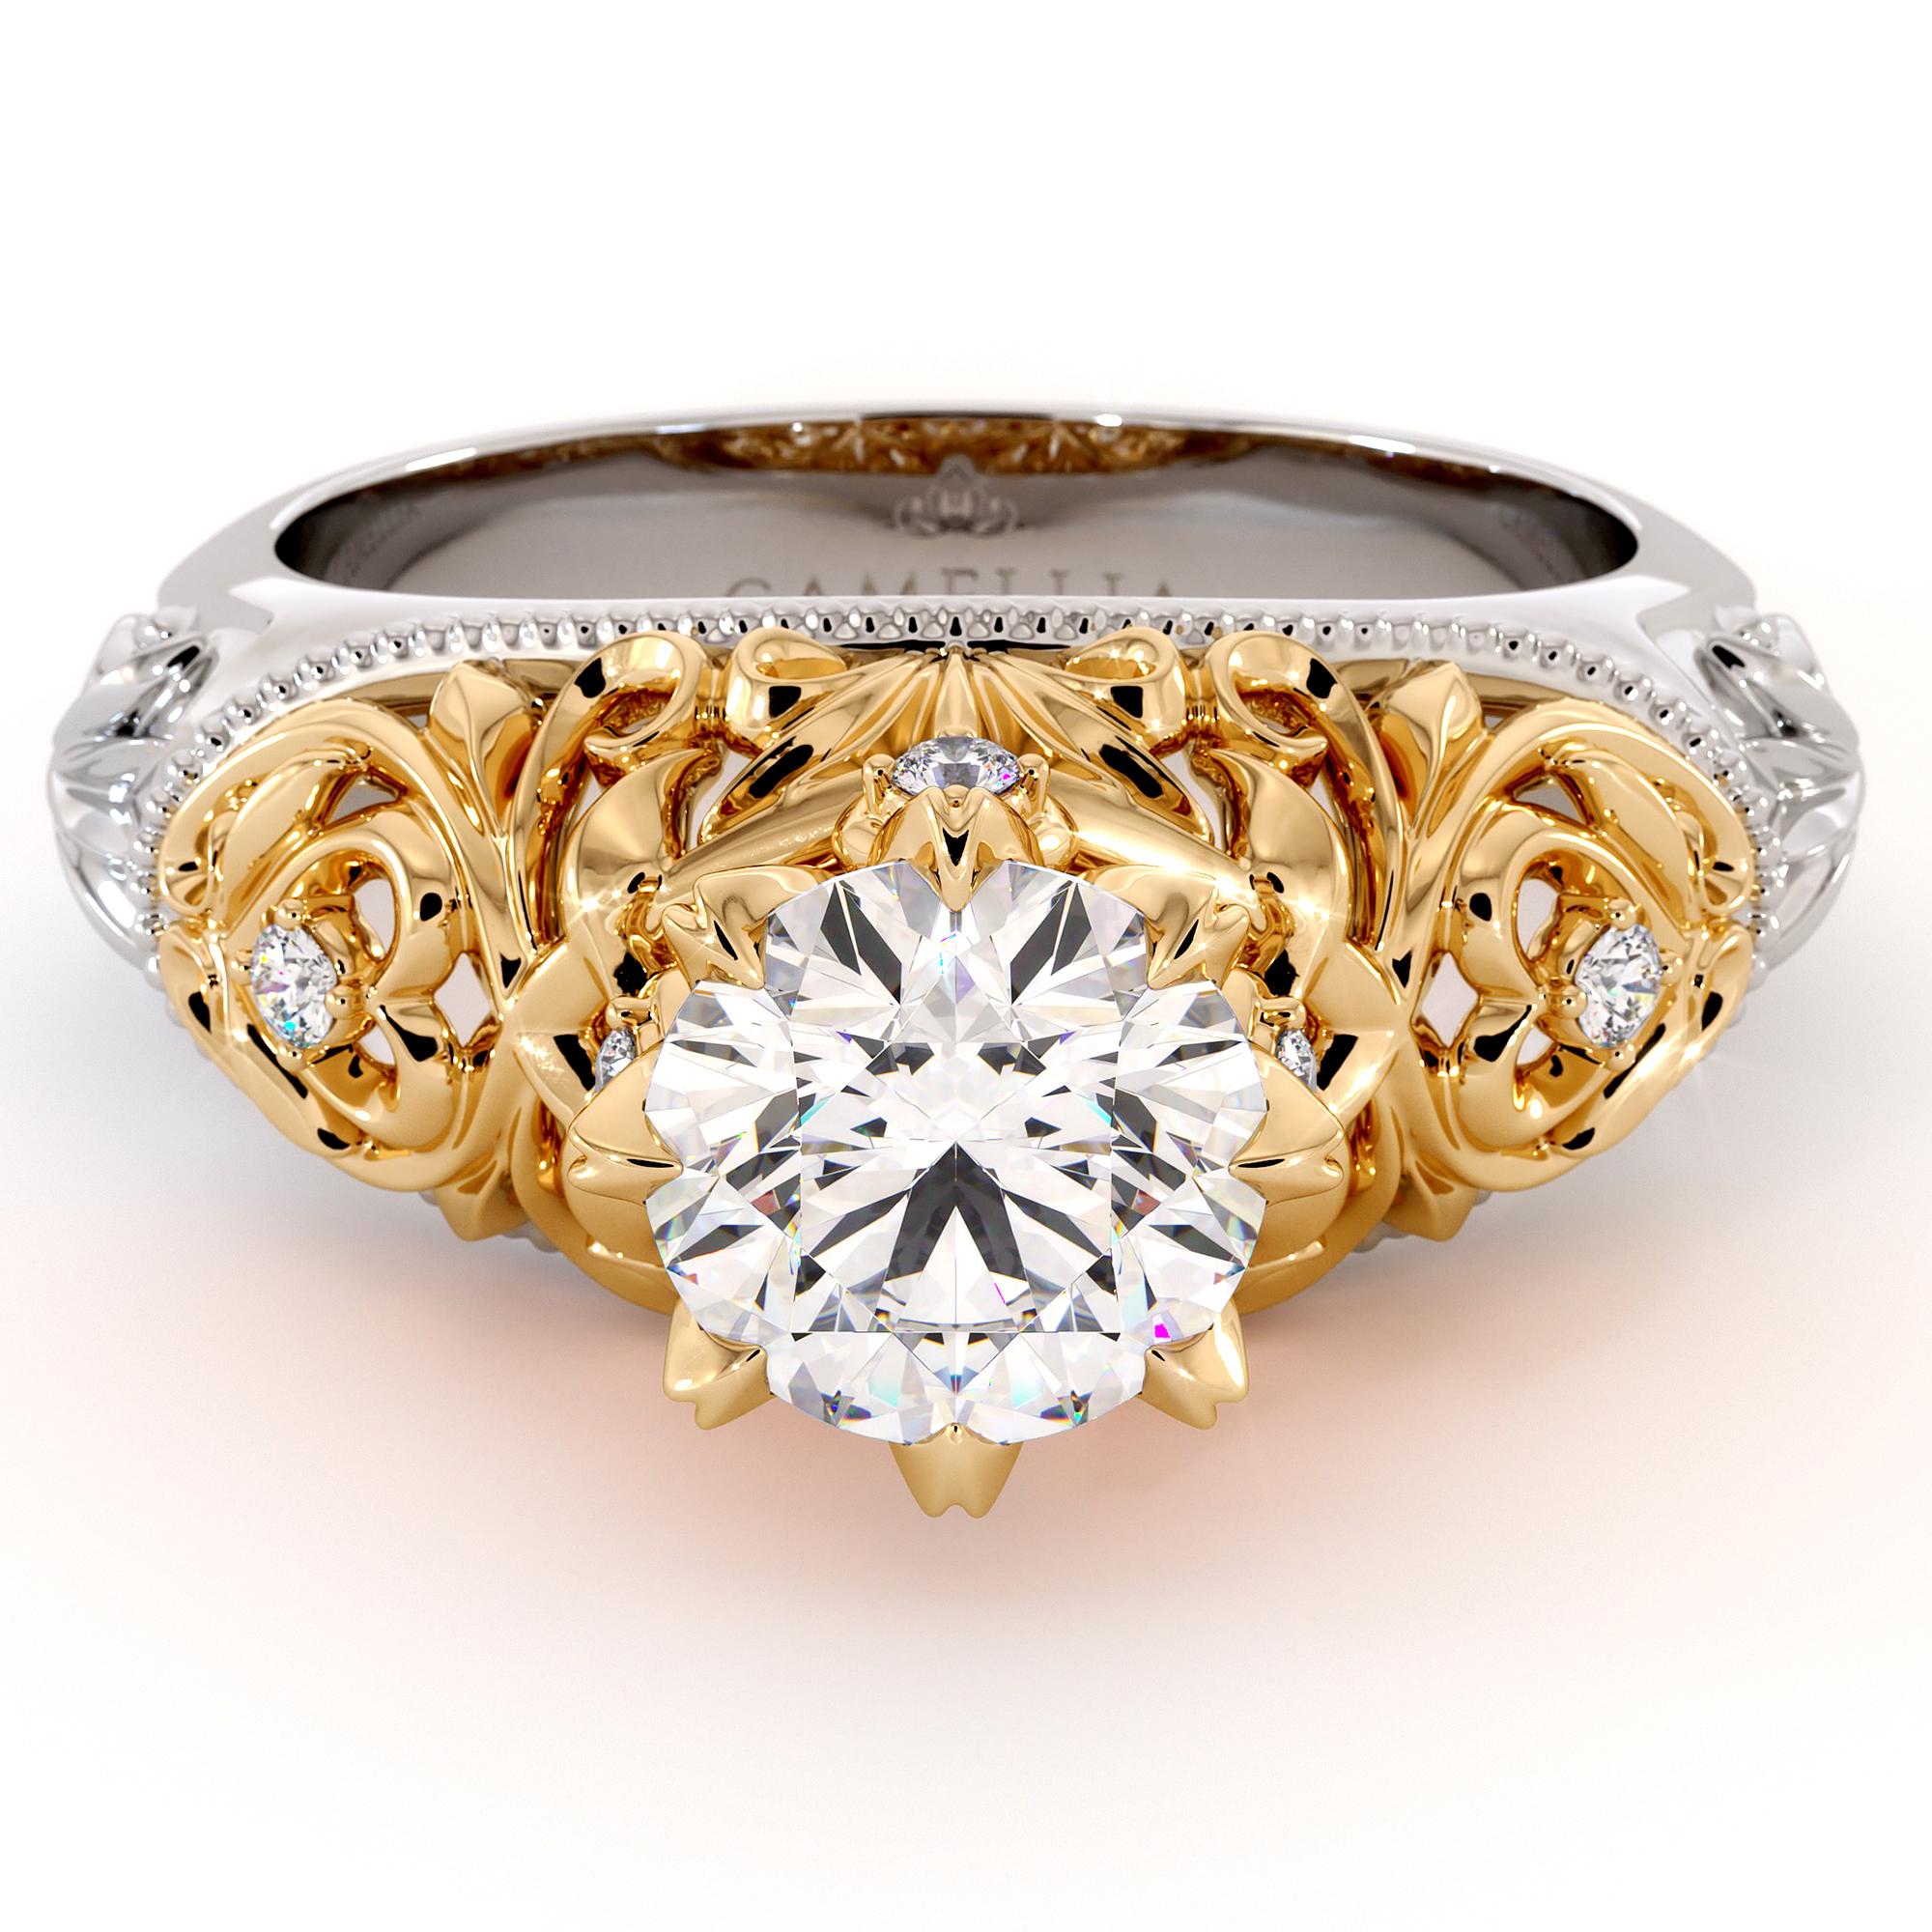 Leaves Engagement Ring Round 1.55 Ct. Moissanite Ring Diamonds Ring Majestic Heart Shape Filigree Gold Engagement Ring